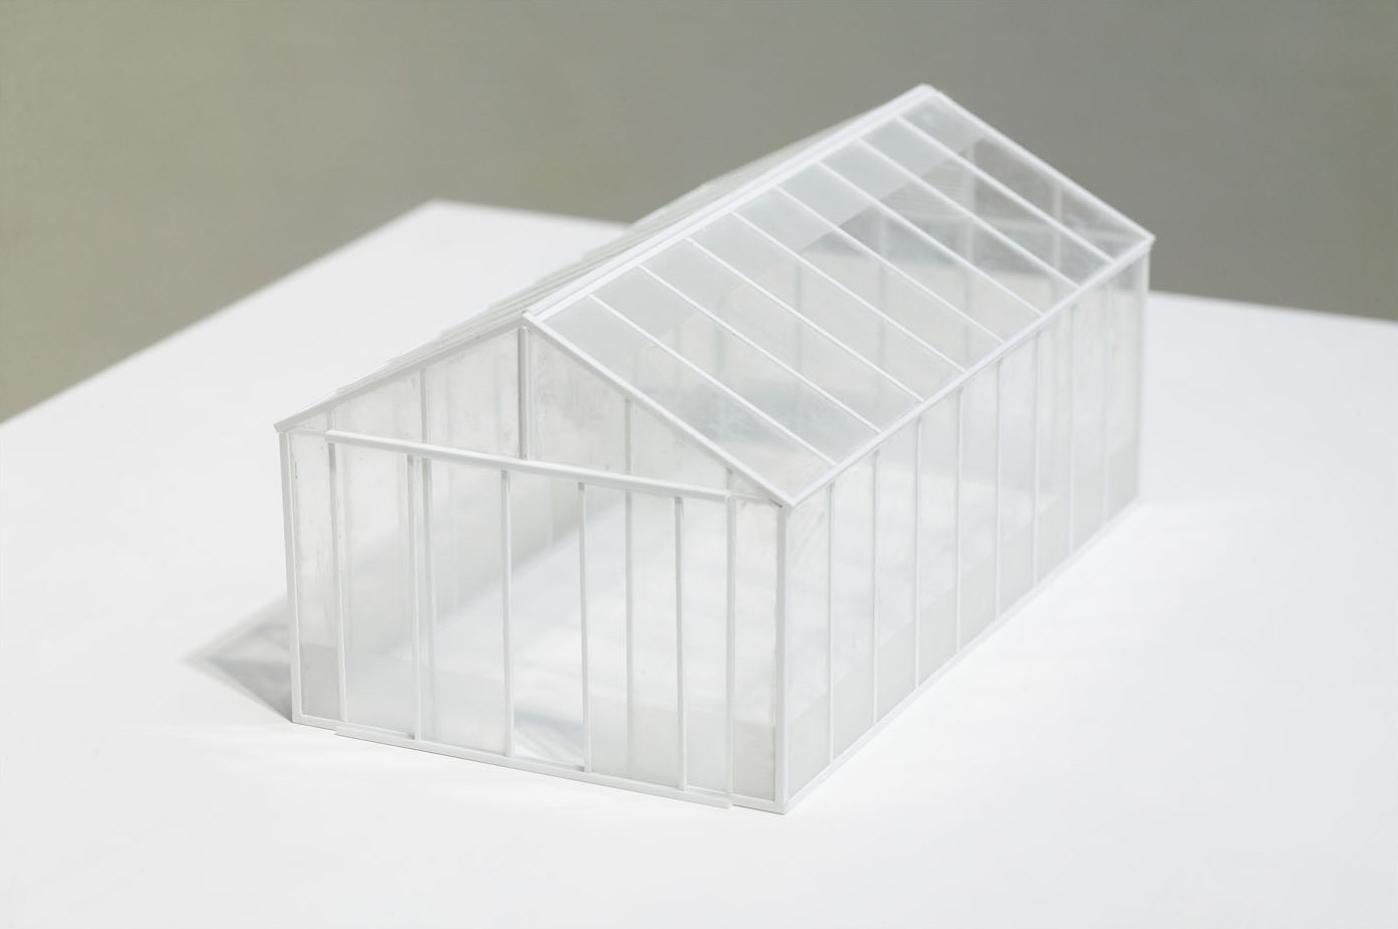 GLASS HOUSE Microscope Slides, Plastic, Acrylic on Plywood 133 x 63.5 x 52 cm